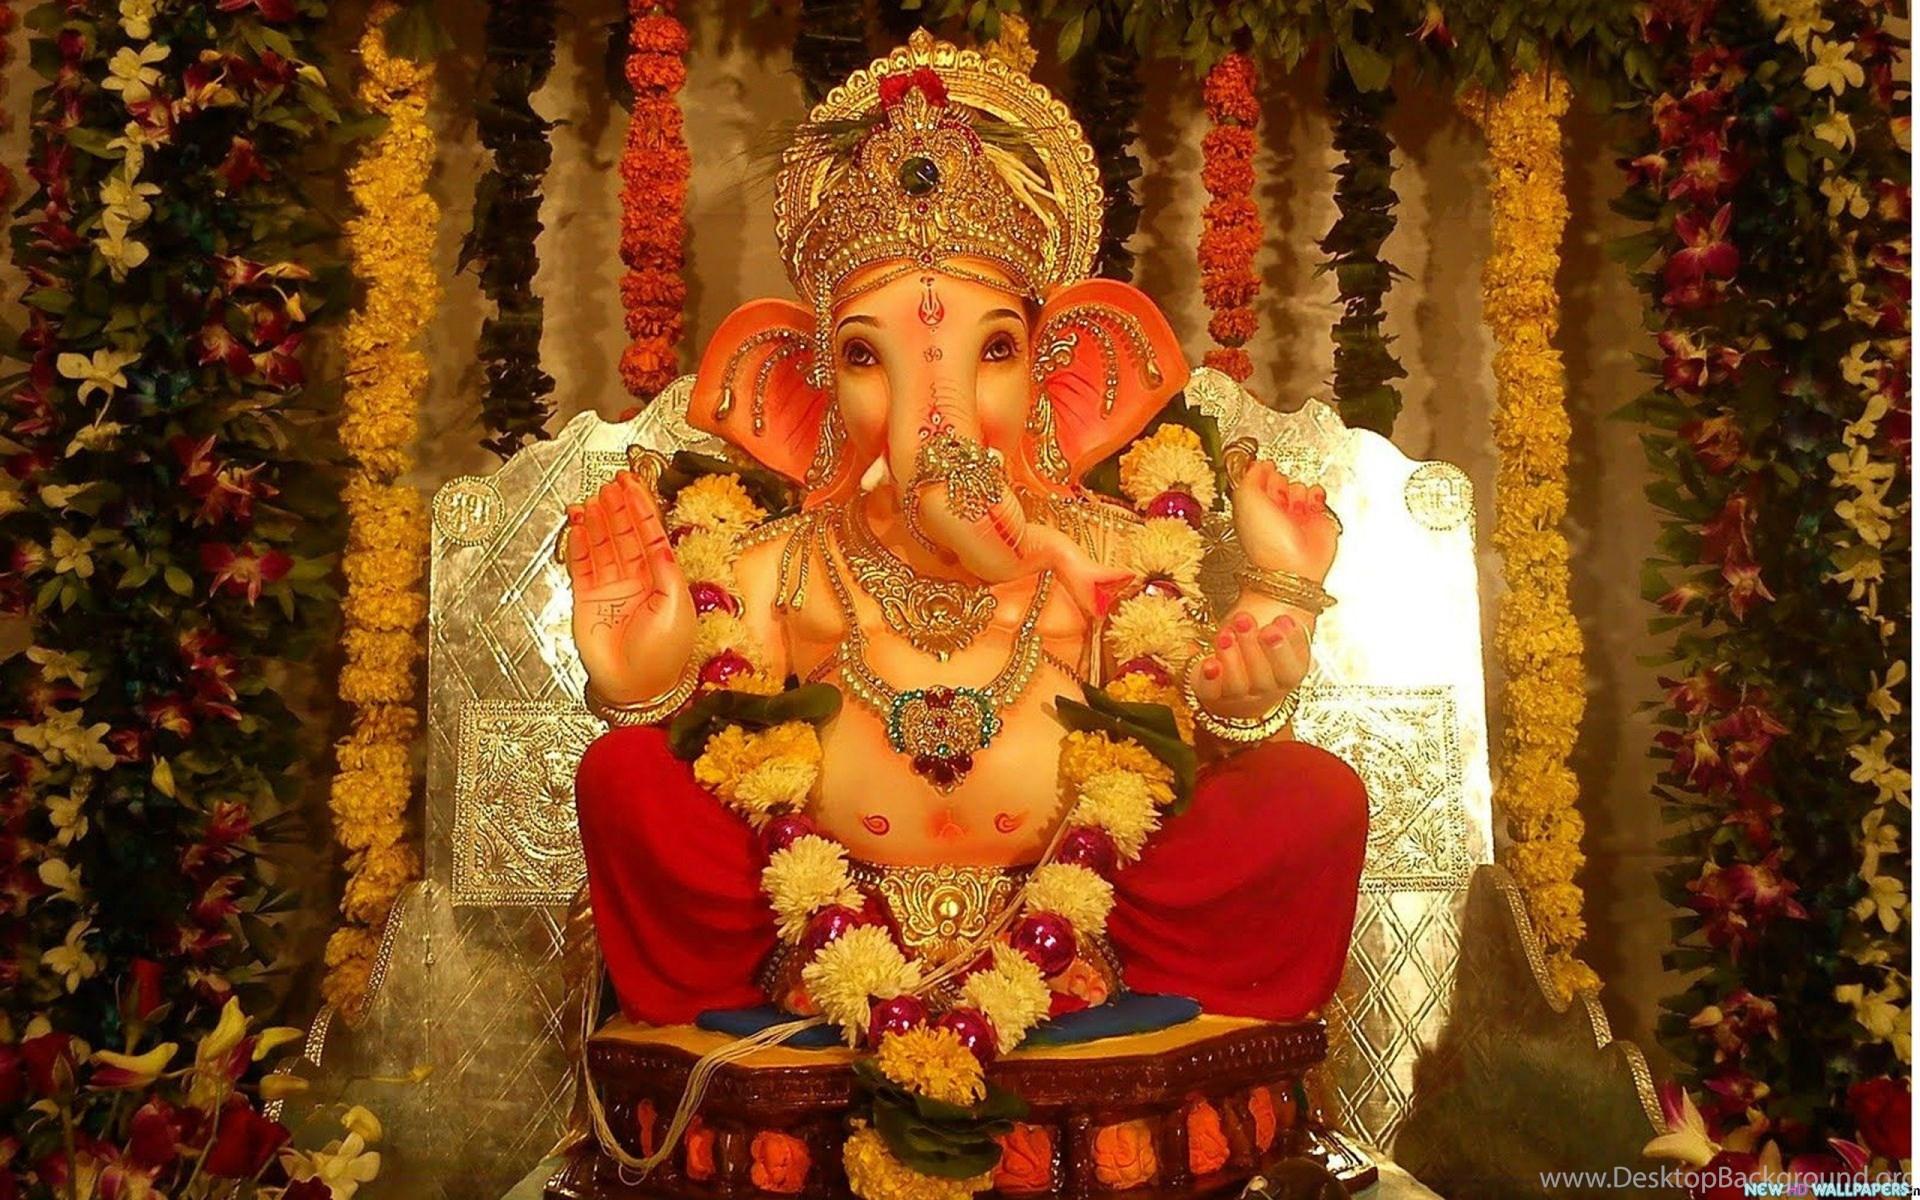 Latest Lord Ganesha HD Wallpapers High Quality Photos Free Desktop